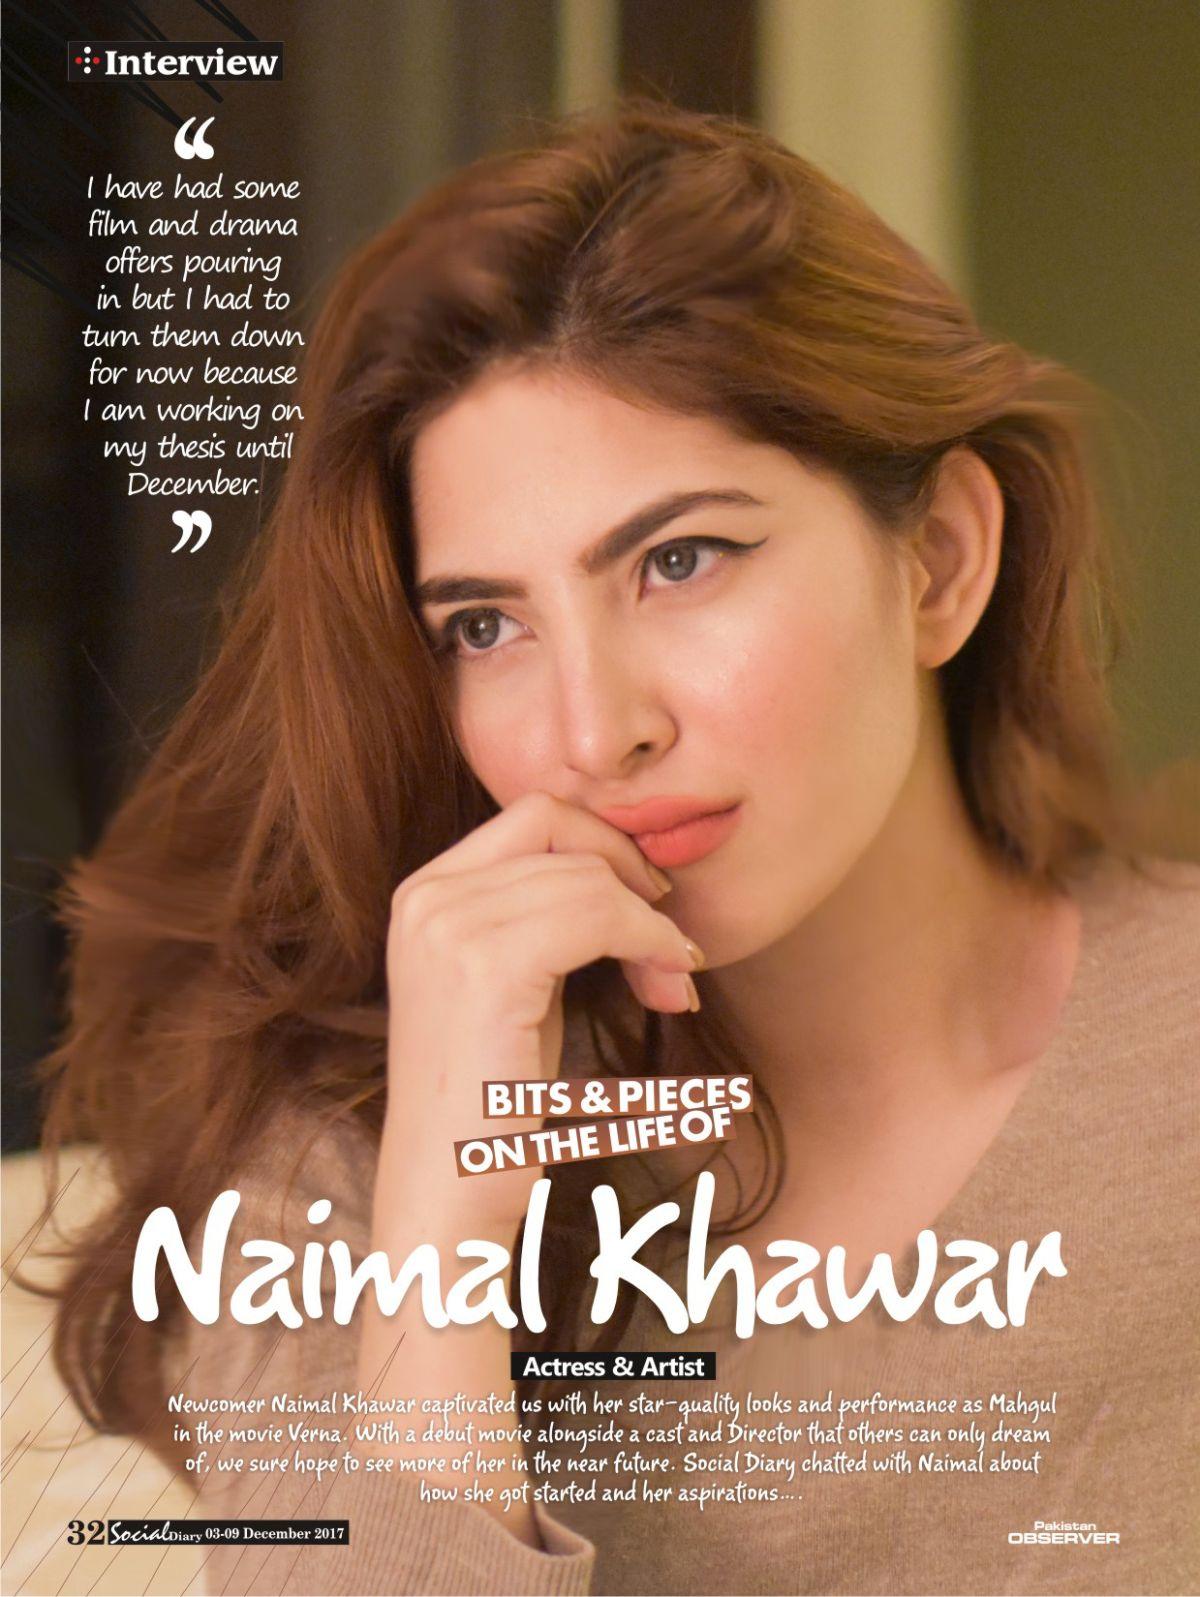 Bits and Pieces on the life of Naimal Khawar | Social Diary